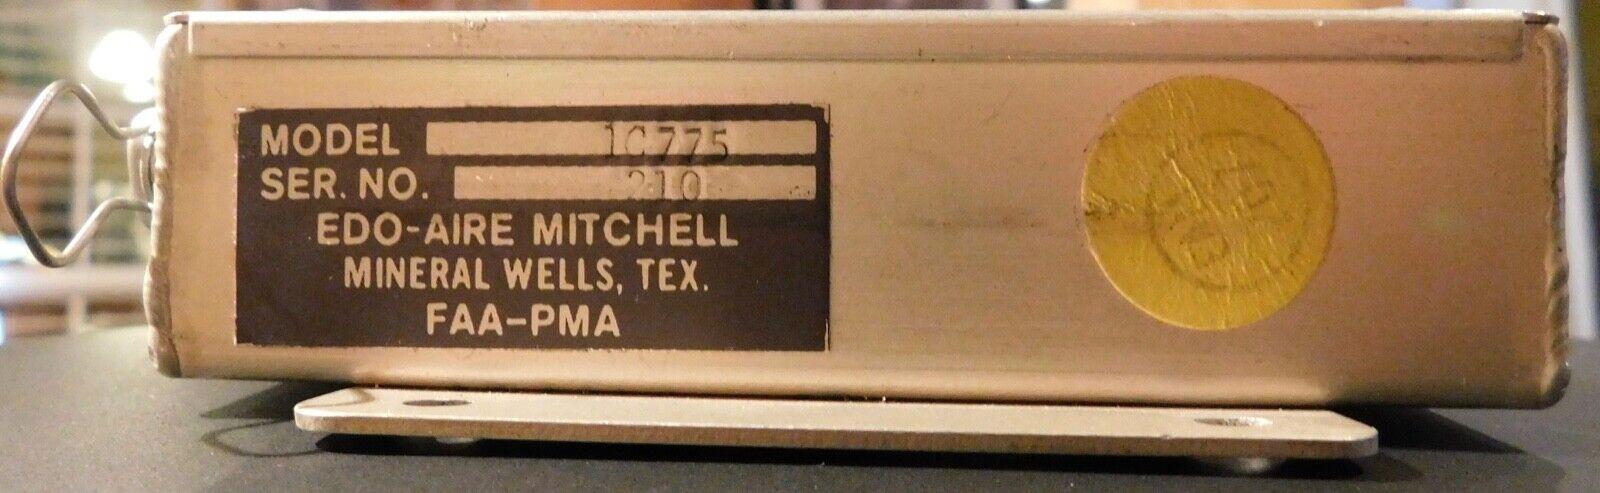 EDO-AIRE MITCHELL AUTOPILOT GLIDESLOPE COUPLER 1C775